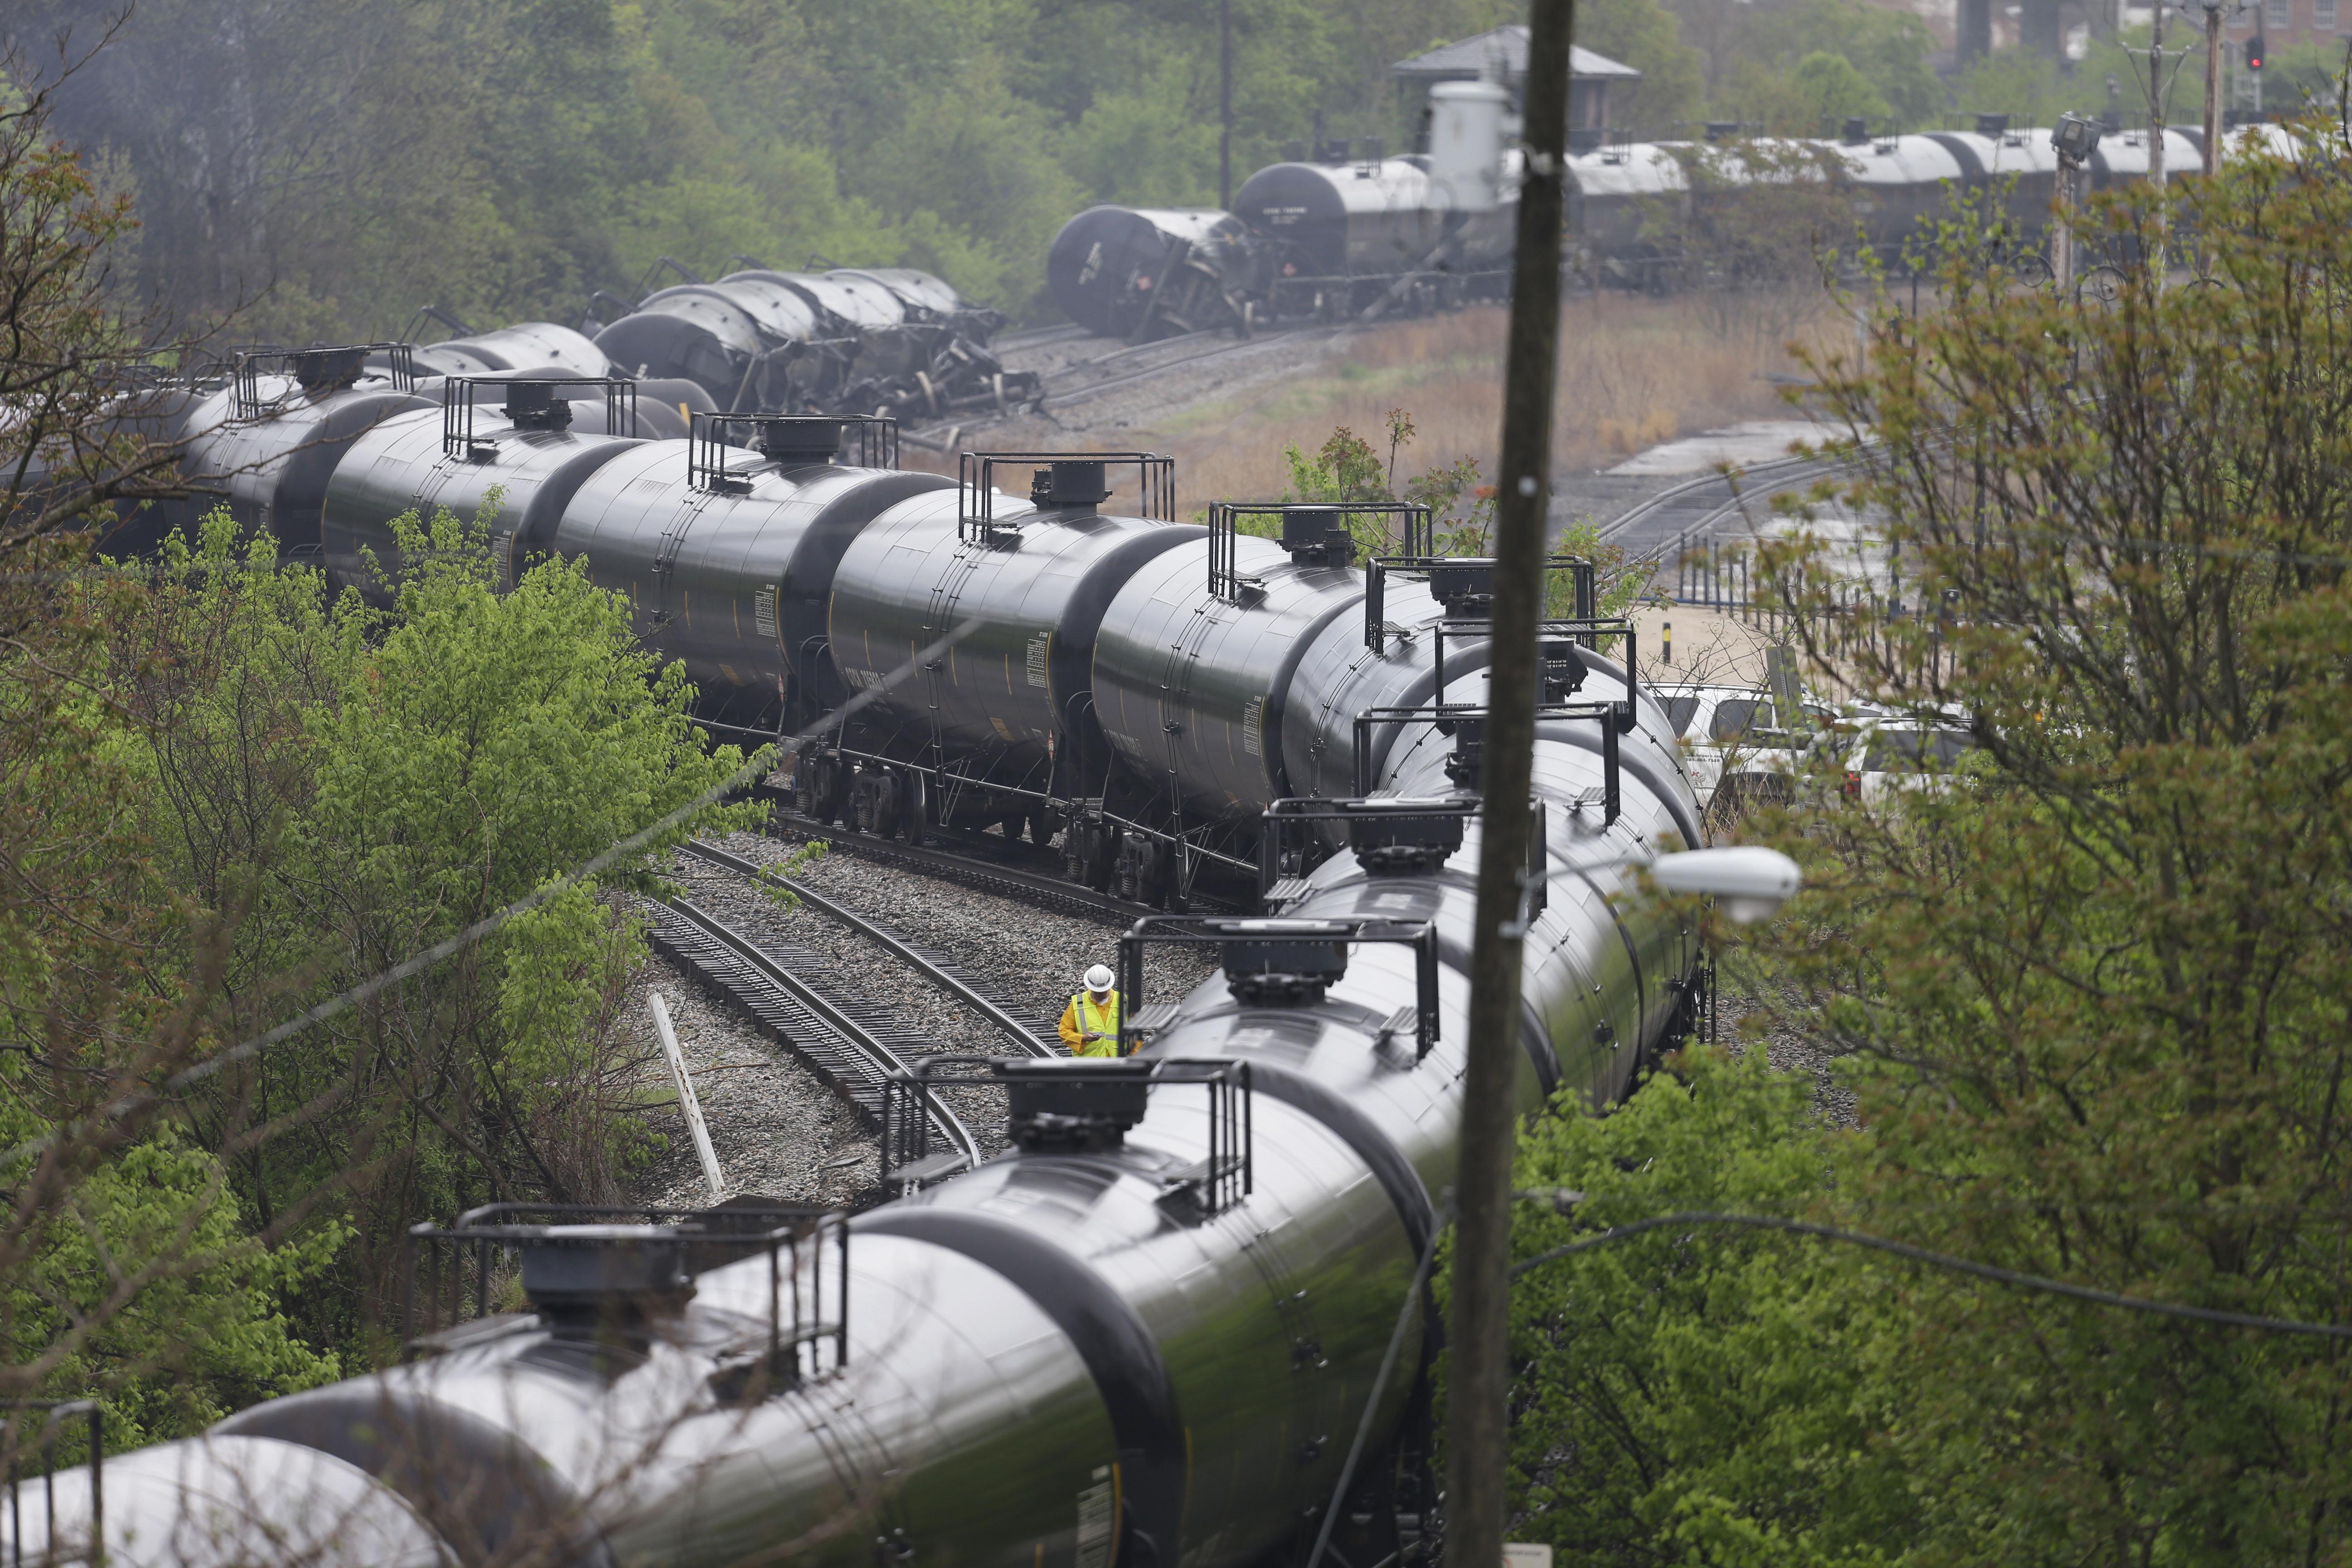 An April 2014 oil train derailment in Lynchburg, Va. A string of ...: https://stateimpact.npr.org/pennsylvania/2015/02/02/oil-train-cars-derail-in-philadelphia/